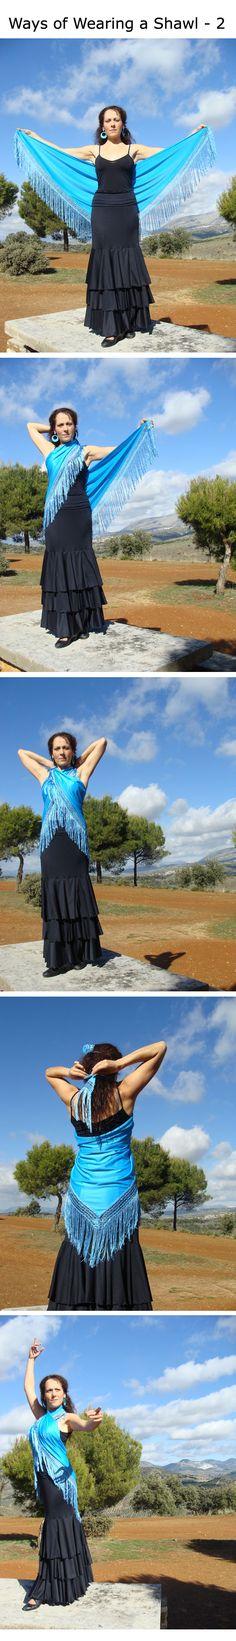 Ways to wear your Flamenco shawl (mantón) - part 2!